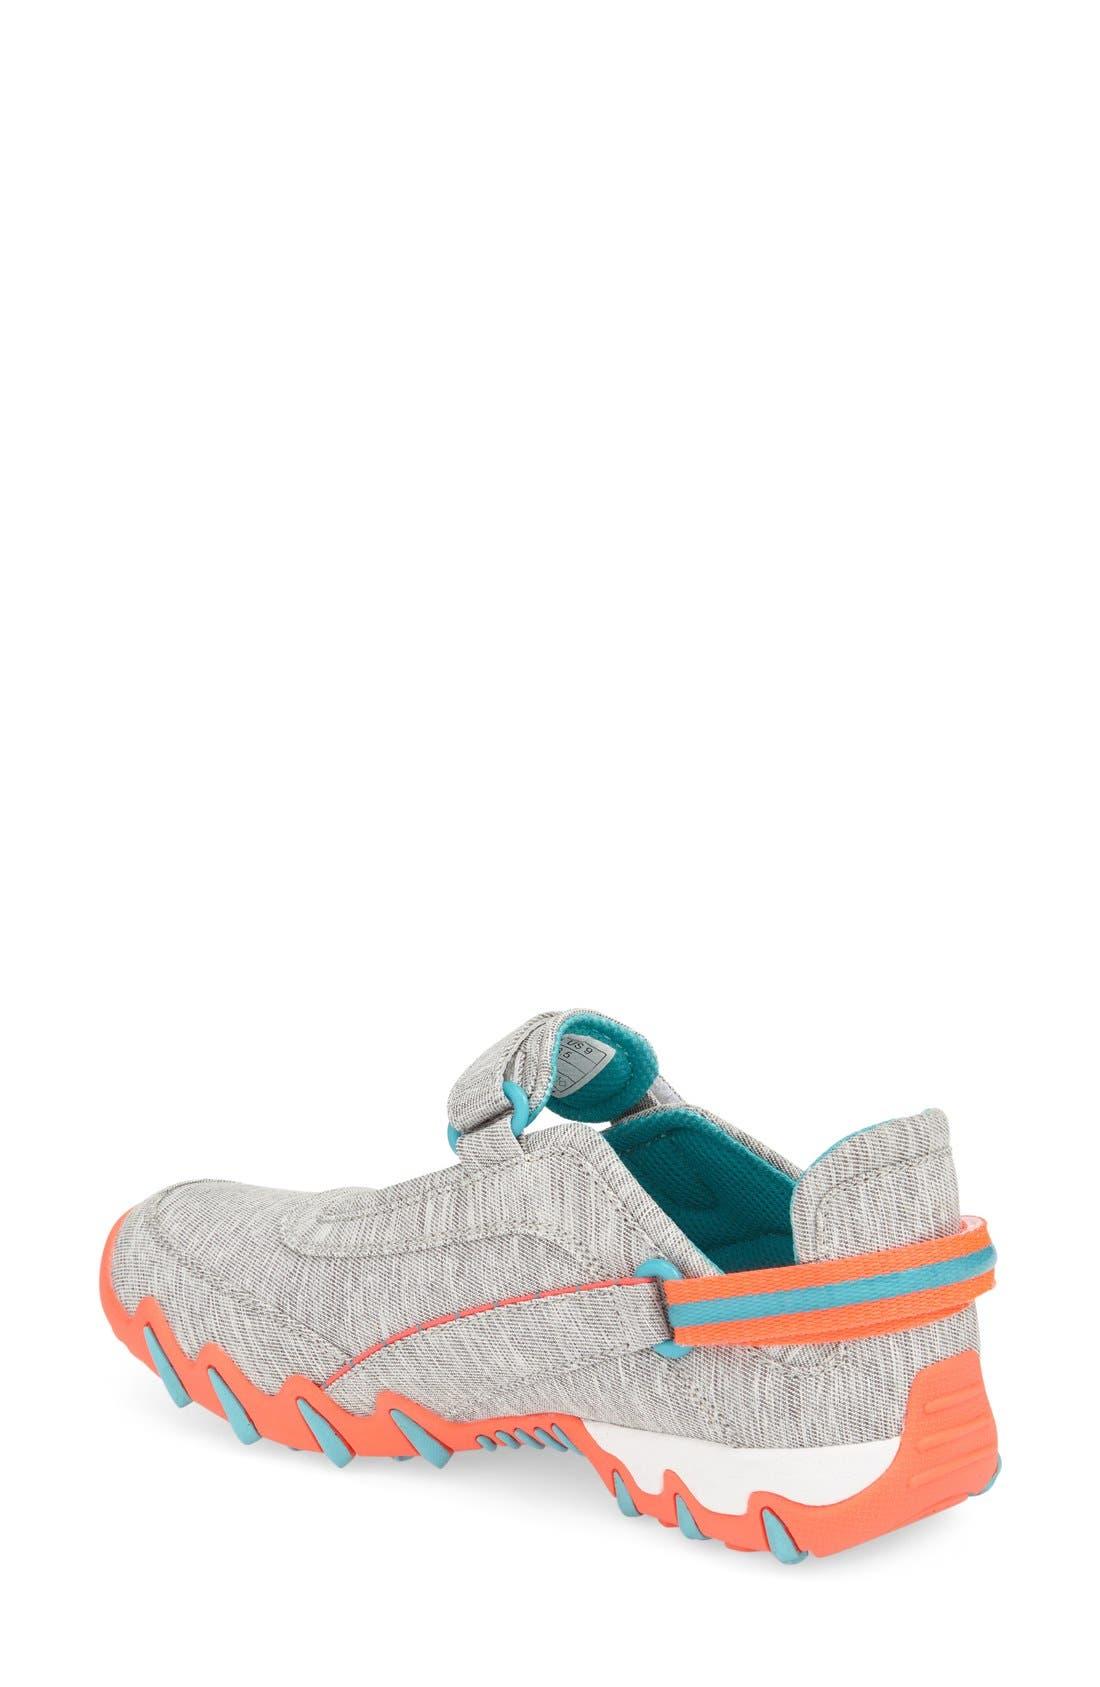 Alternate Image 2  - Allrounder by Mephisto 'Niro' Mary Jane Sneaker (Women)